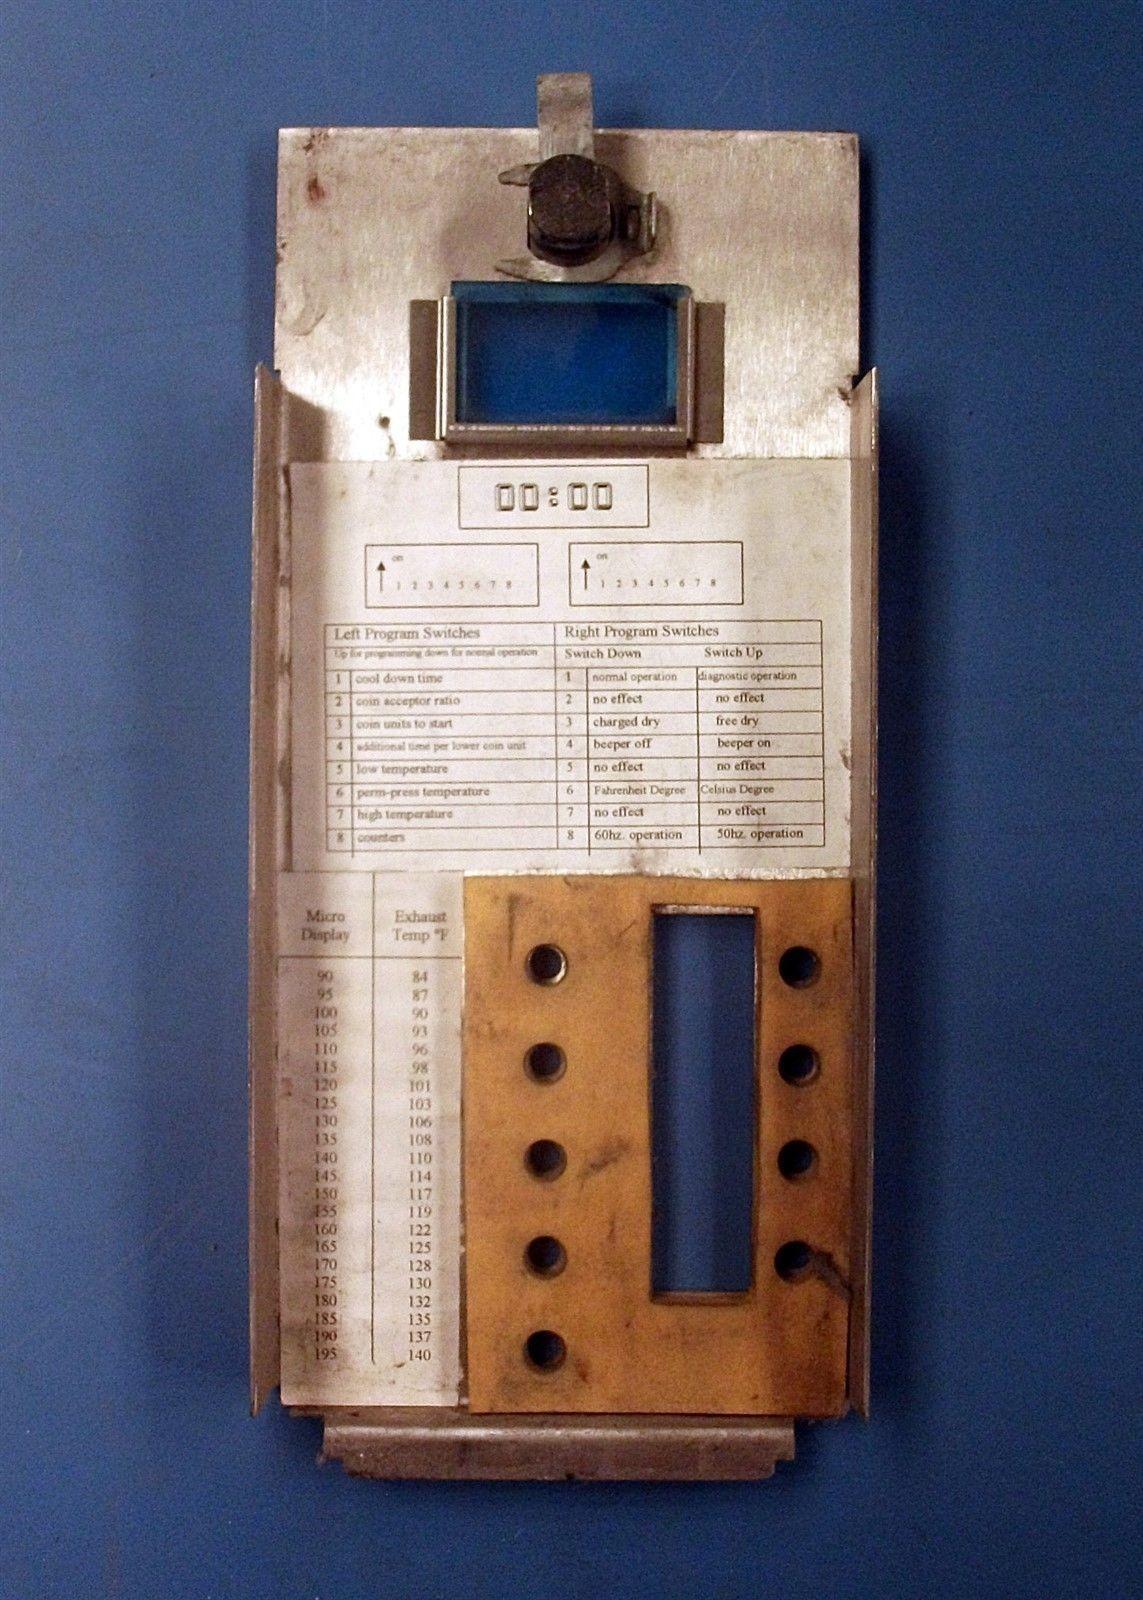 Wascomat Huebsch Speed Queen Upper Dryer Control Faceplate Model jtd32dg